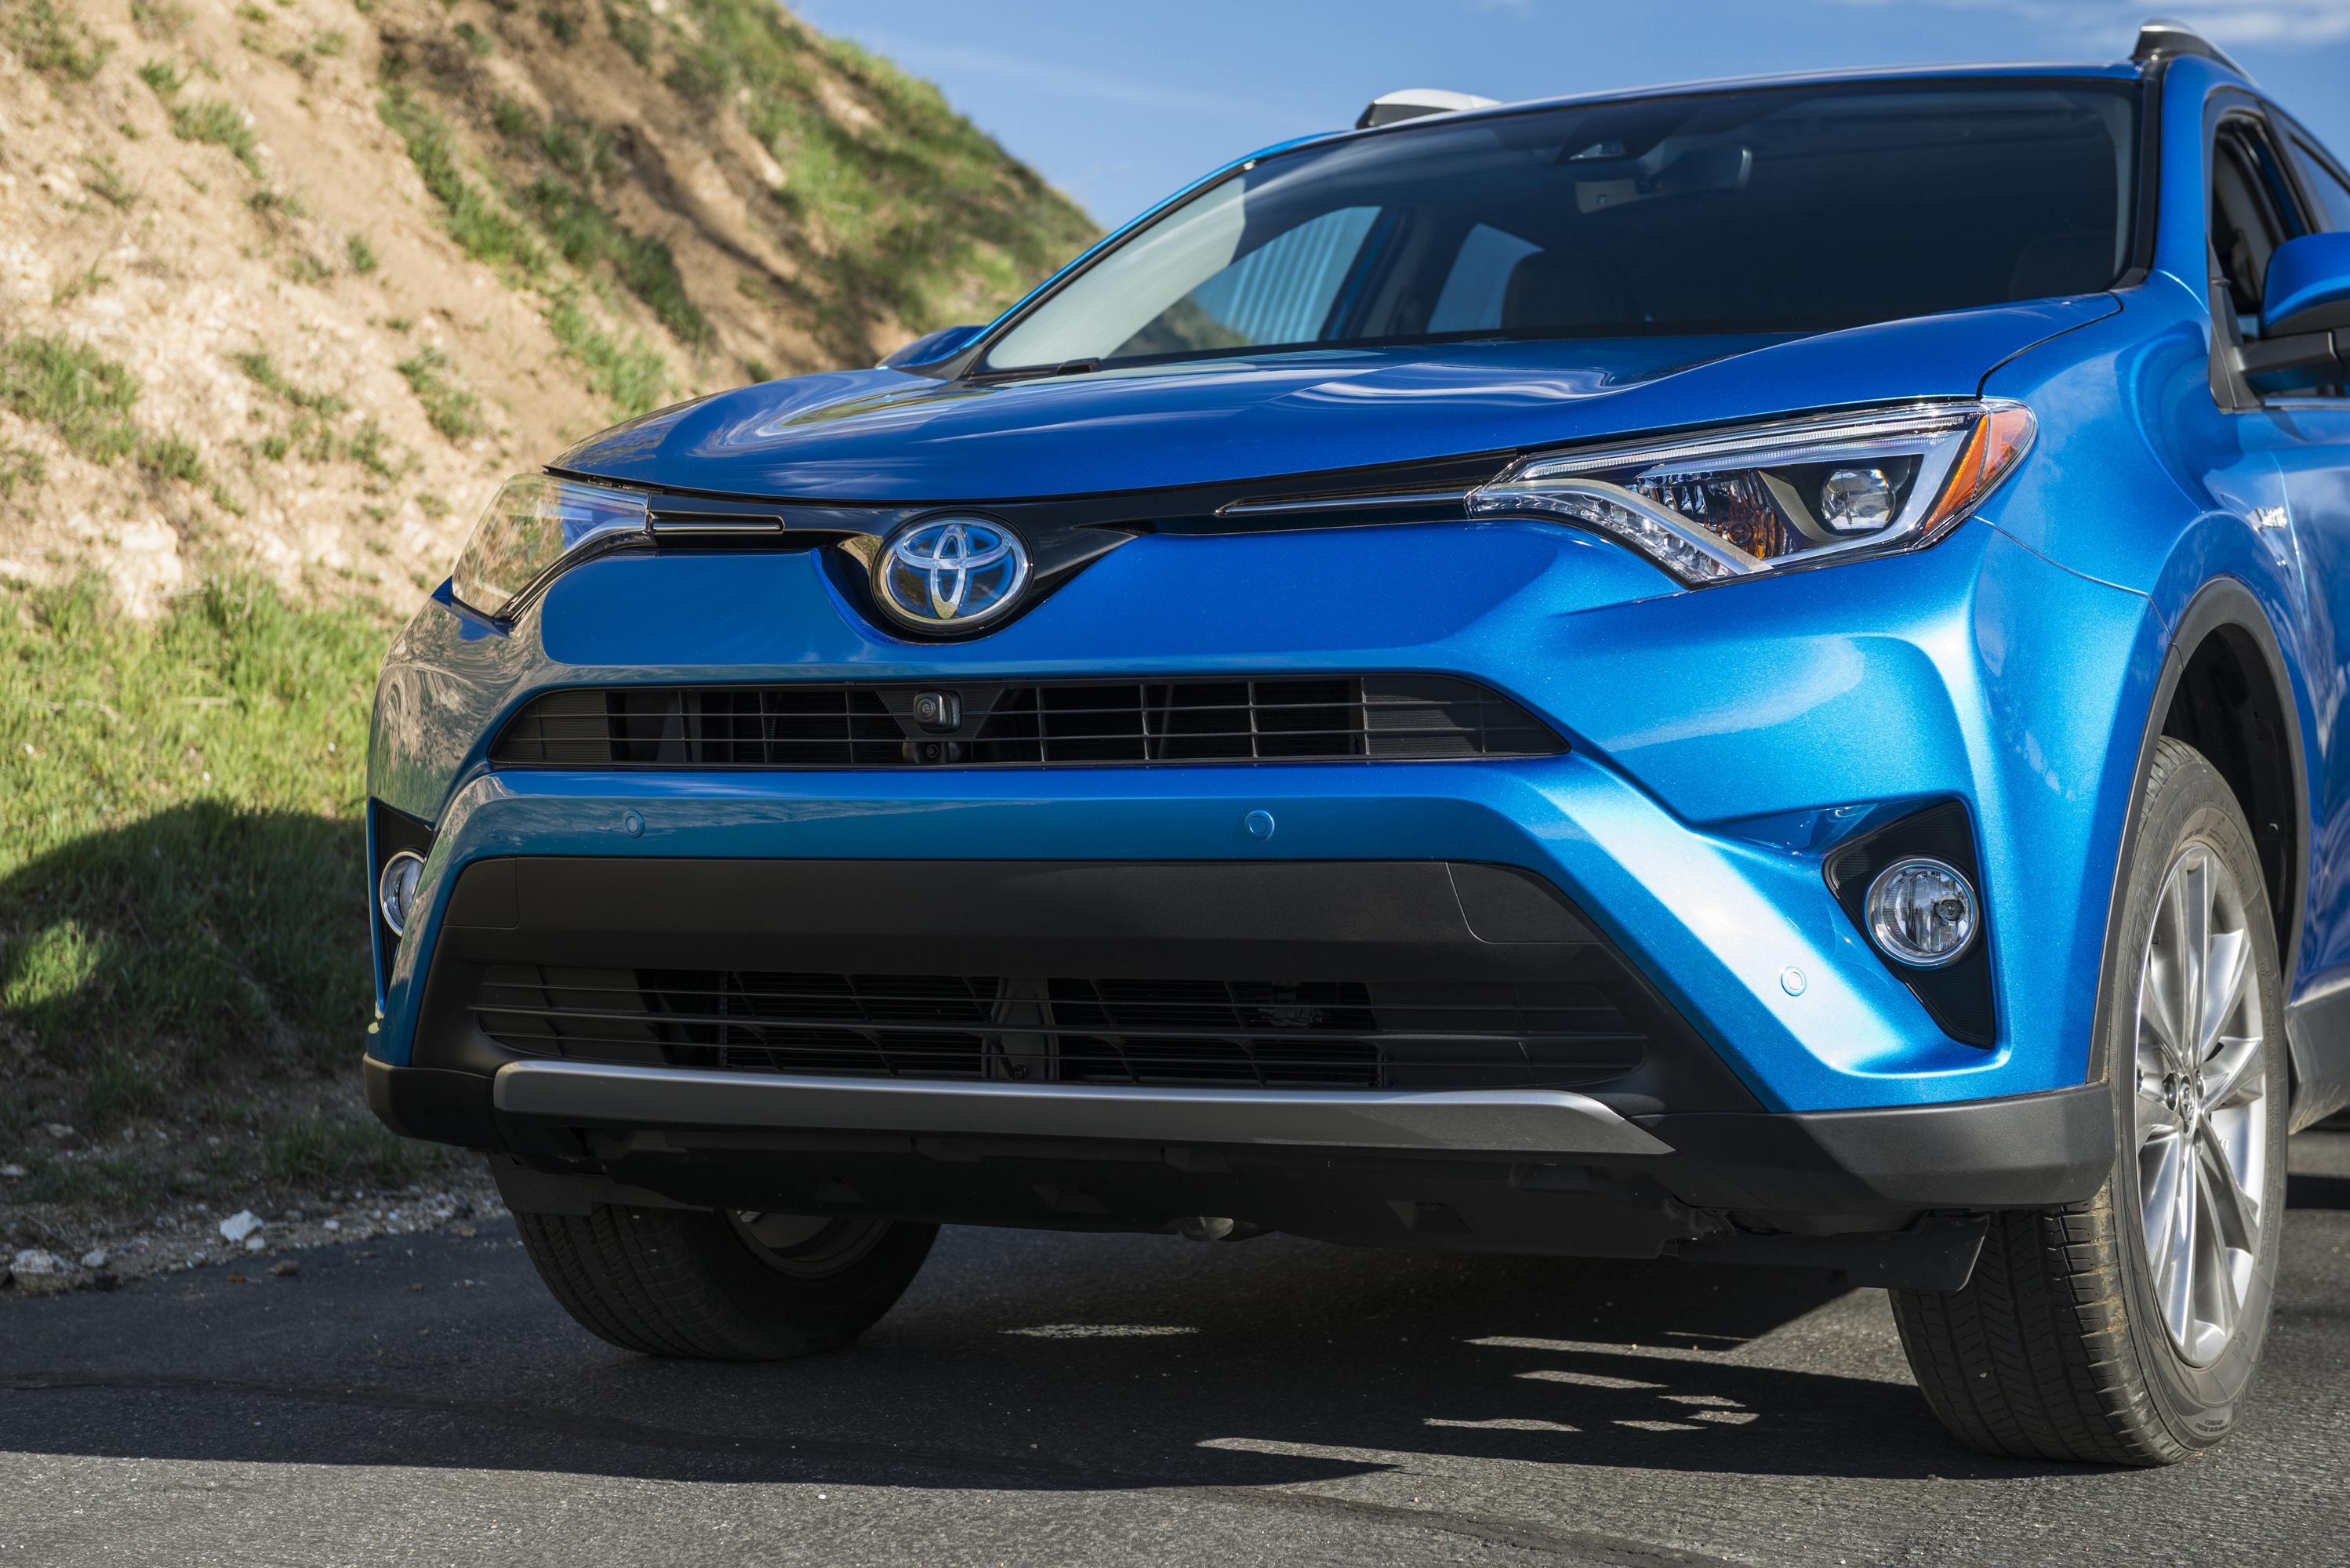 Nuova partnership tra WWF e Toyota